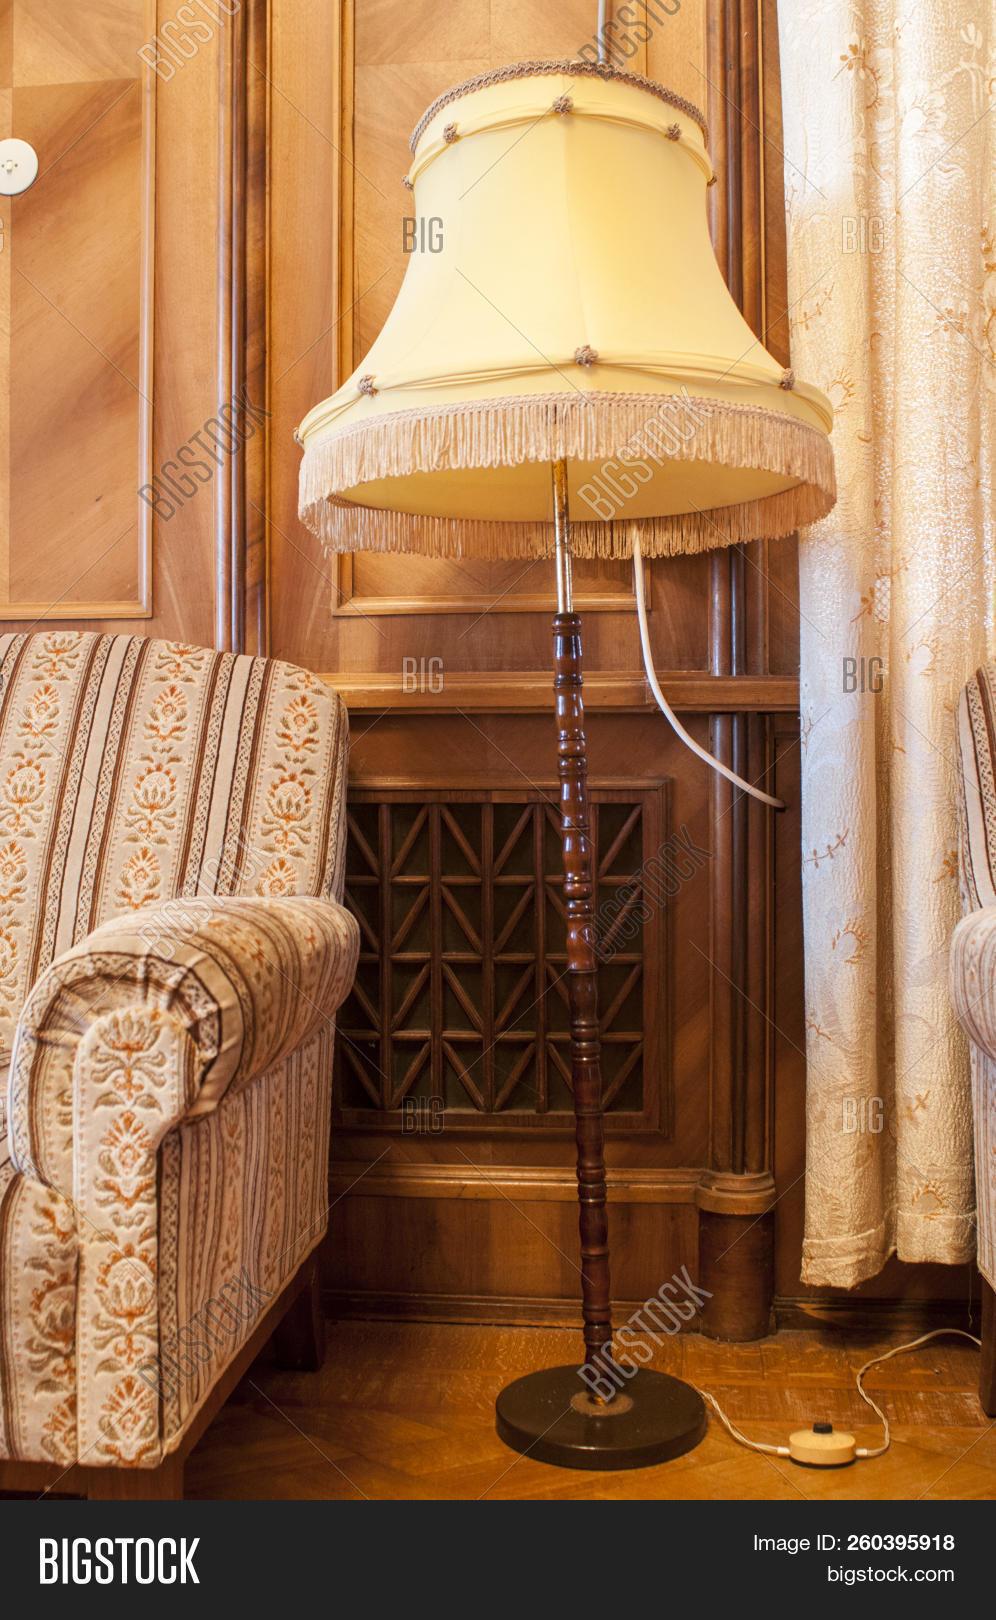 Retro Chair Floor Lamp Image Photo Free Trial Bigstock